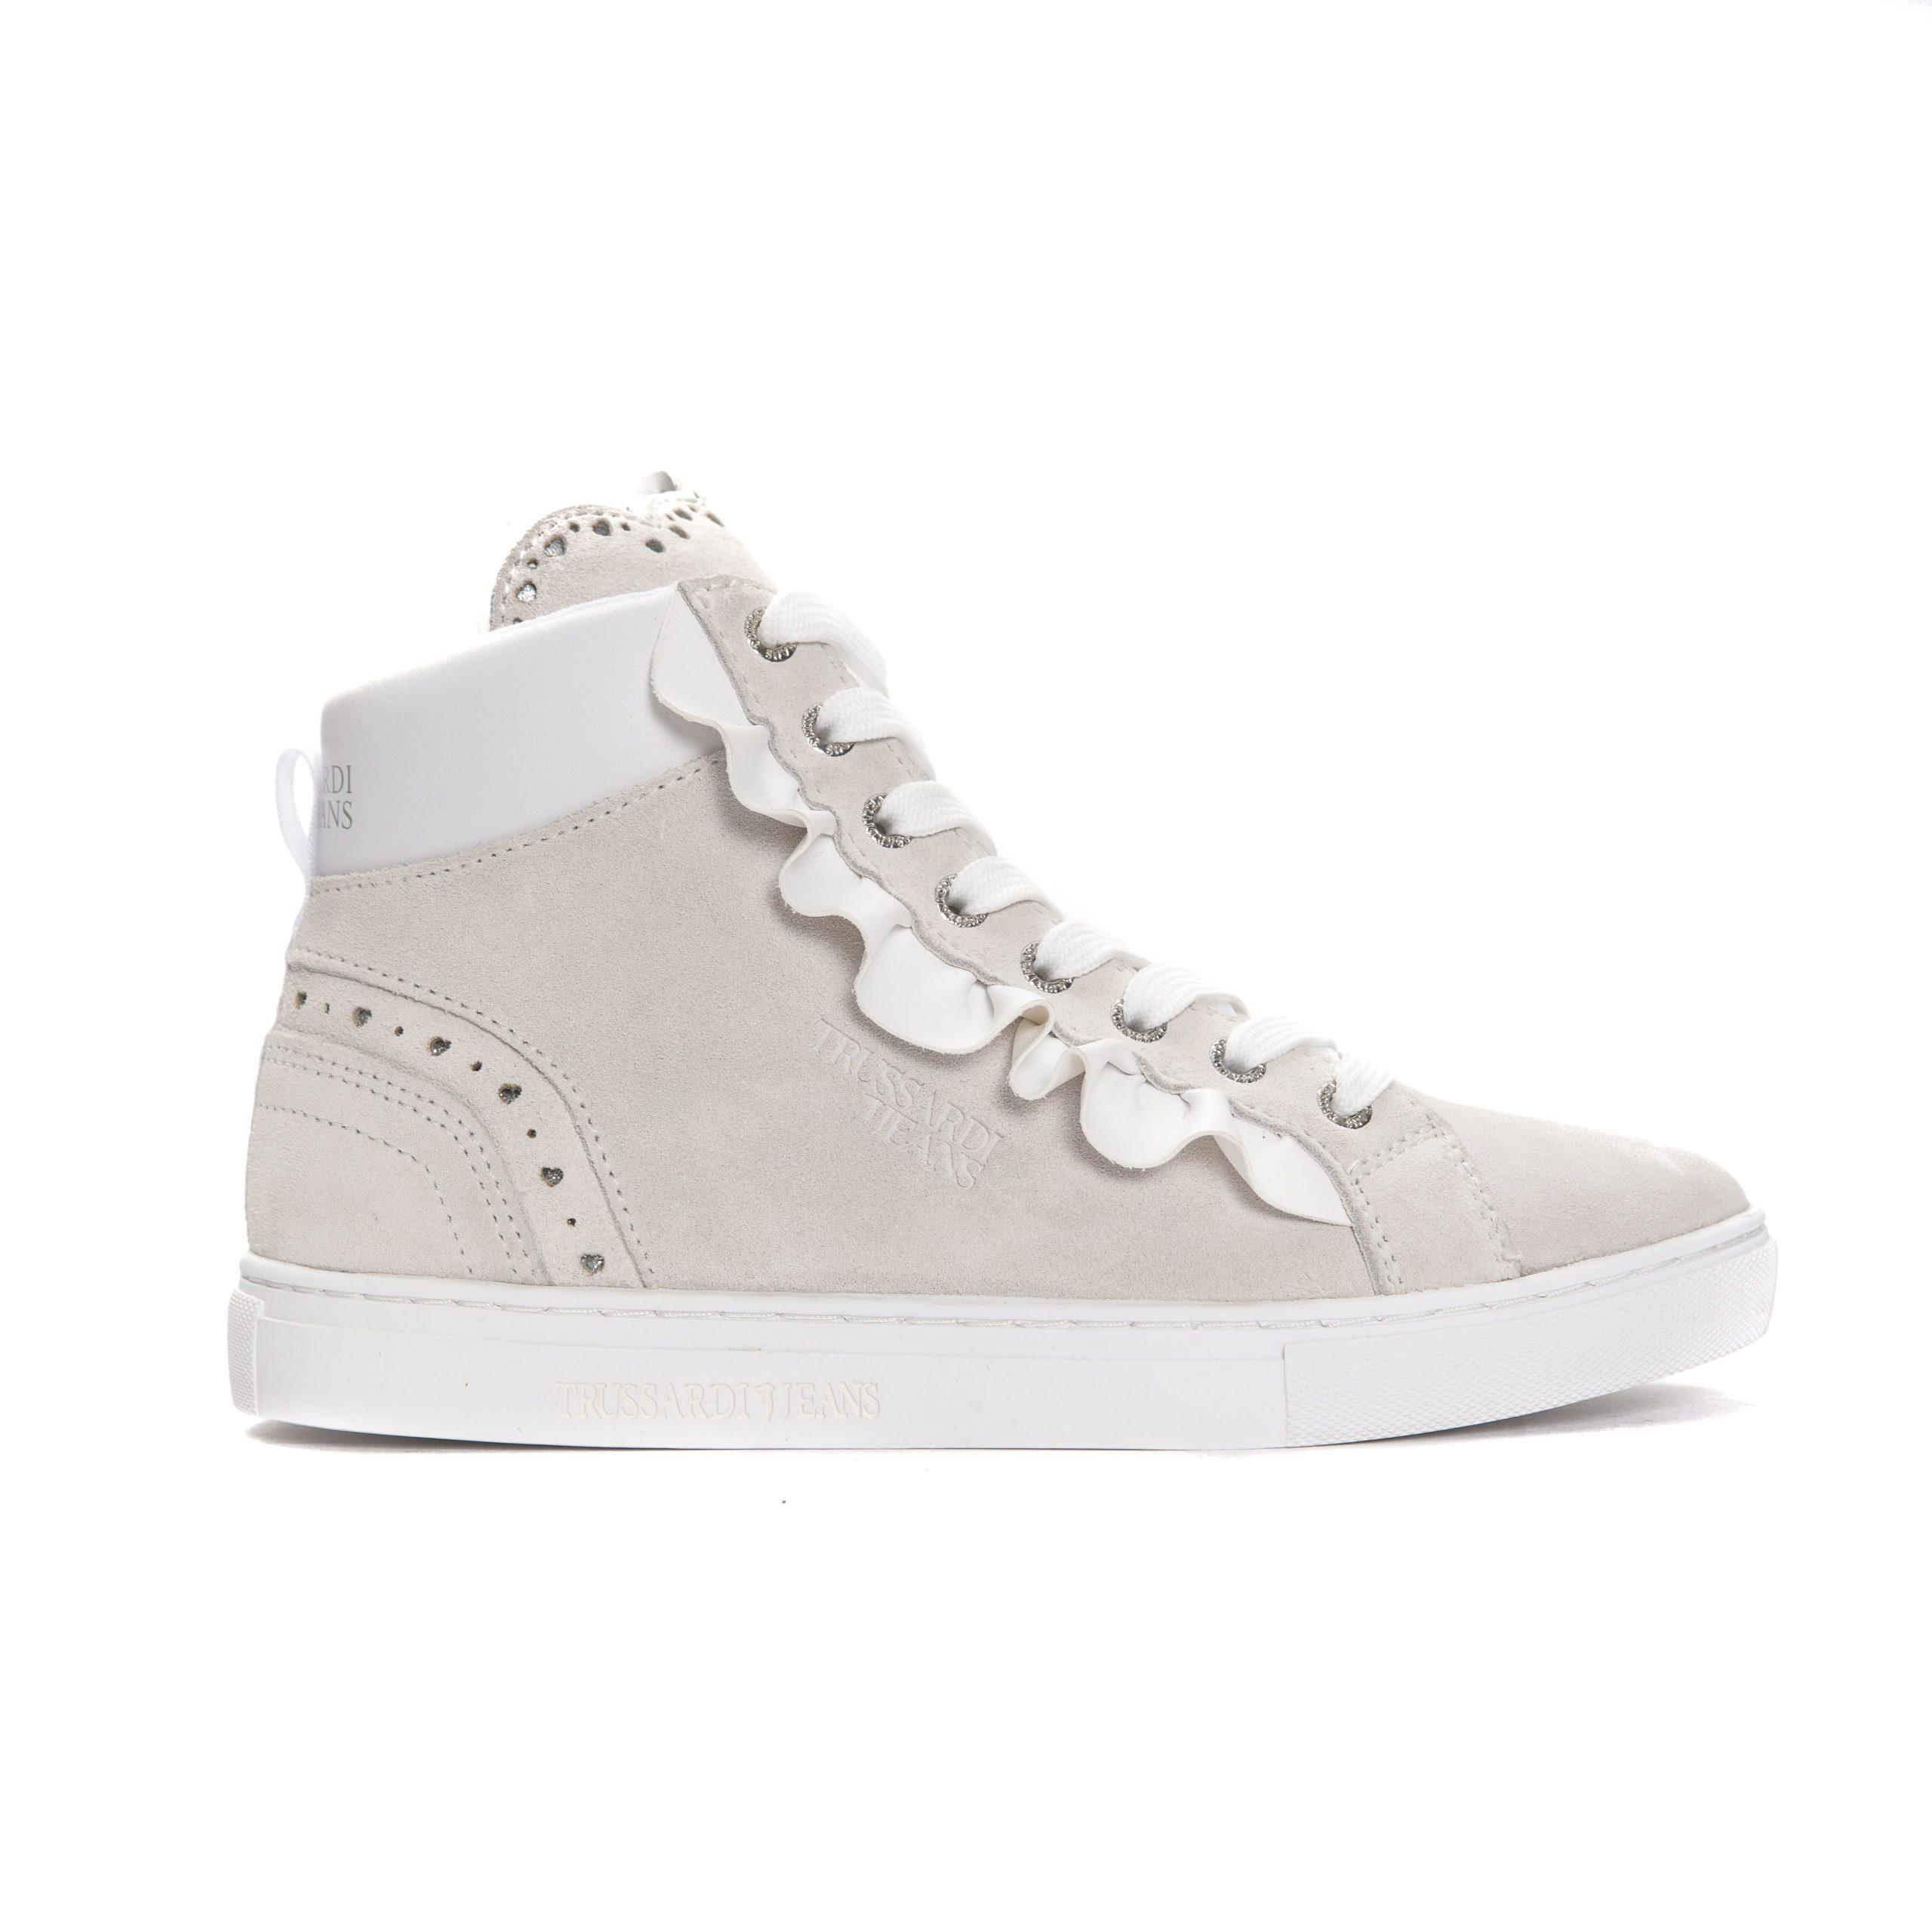 Trussardi Jeans Women's Bianco Trainer White TR662821 - EU35/US4.5